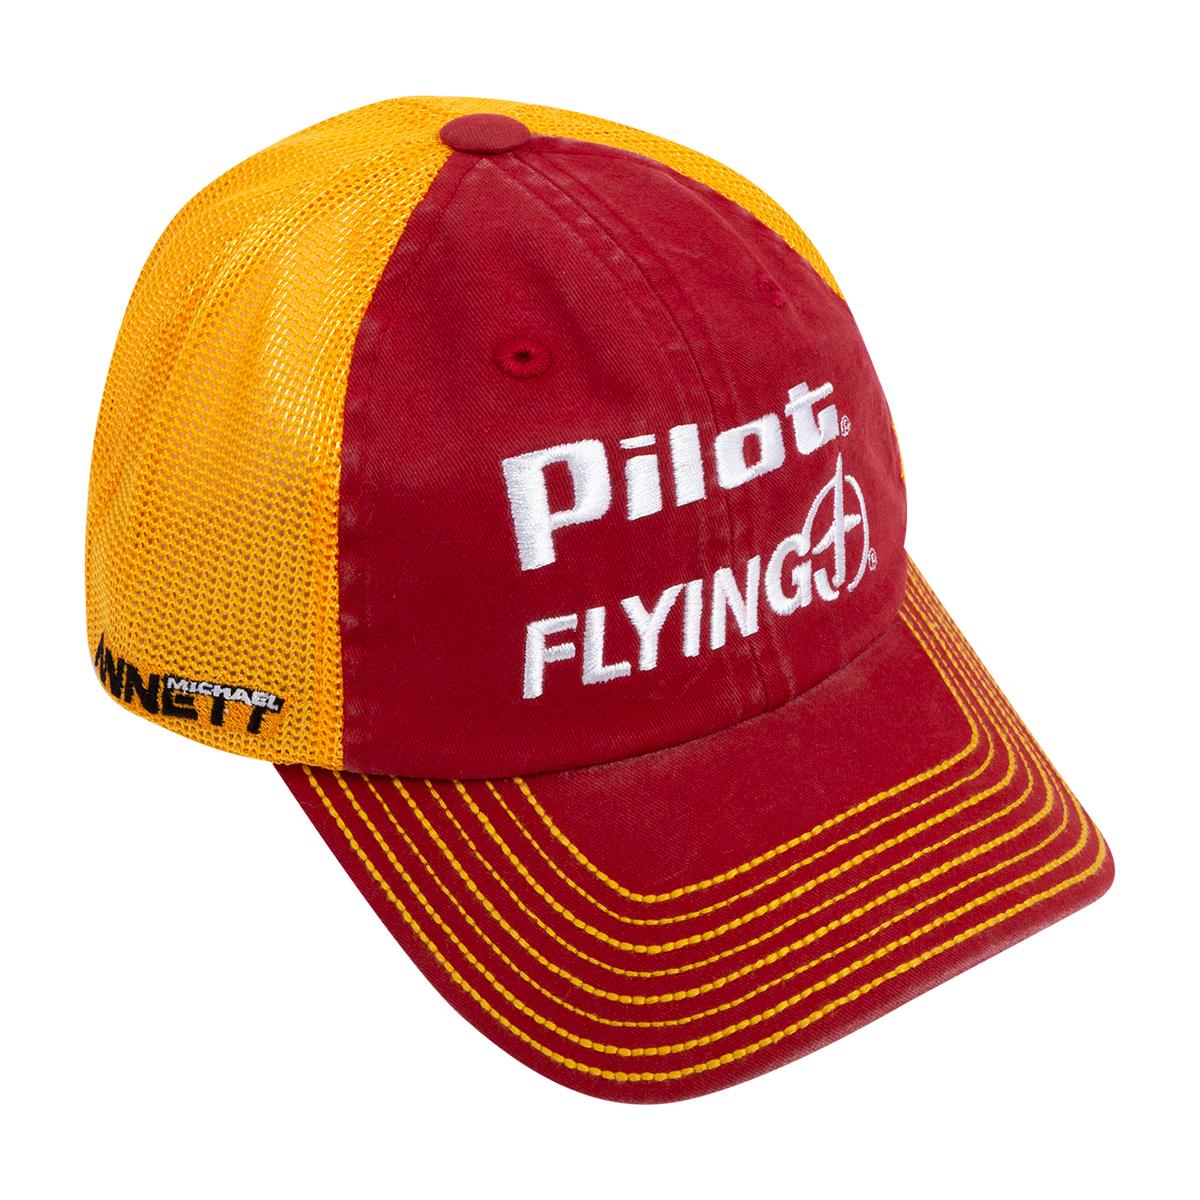 Michael Annett 2018 Xfinity Pilot/Flying Vintage Trucker Hat